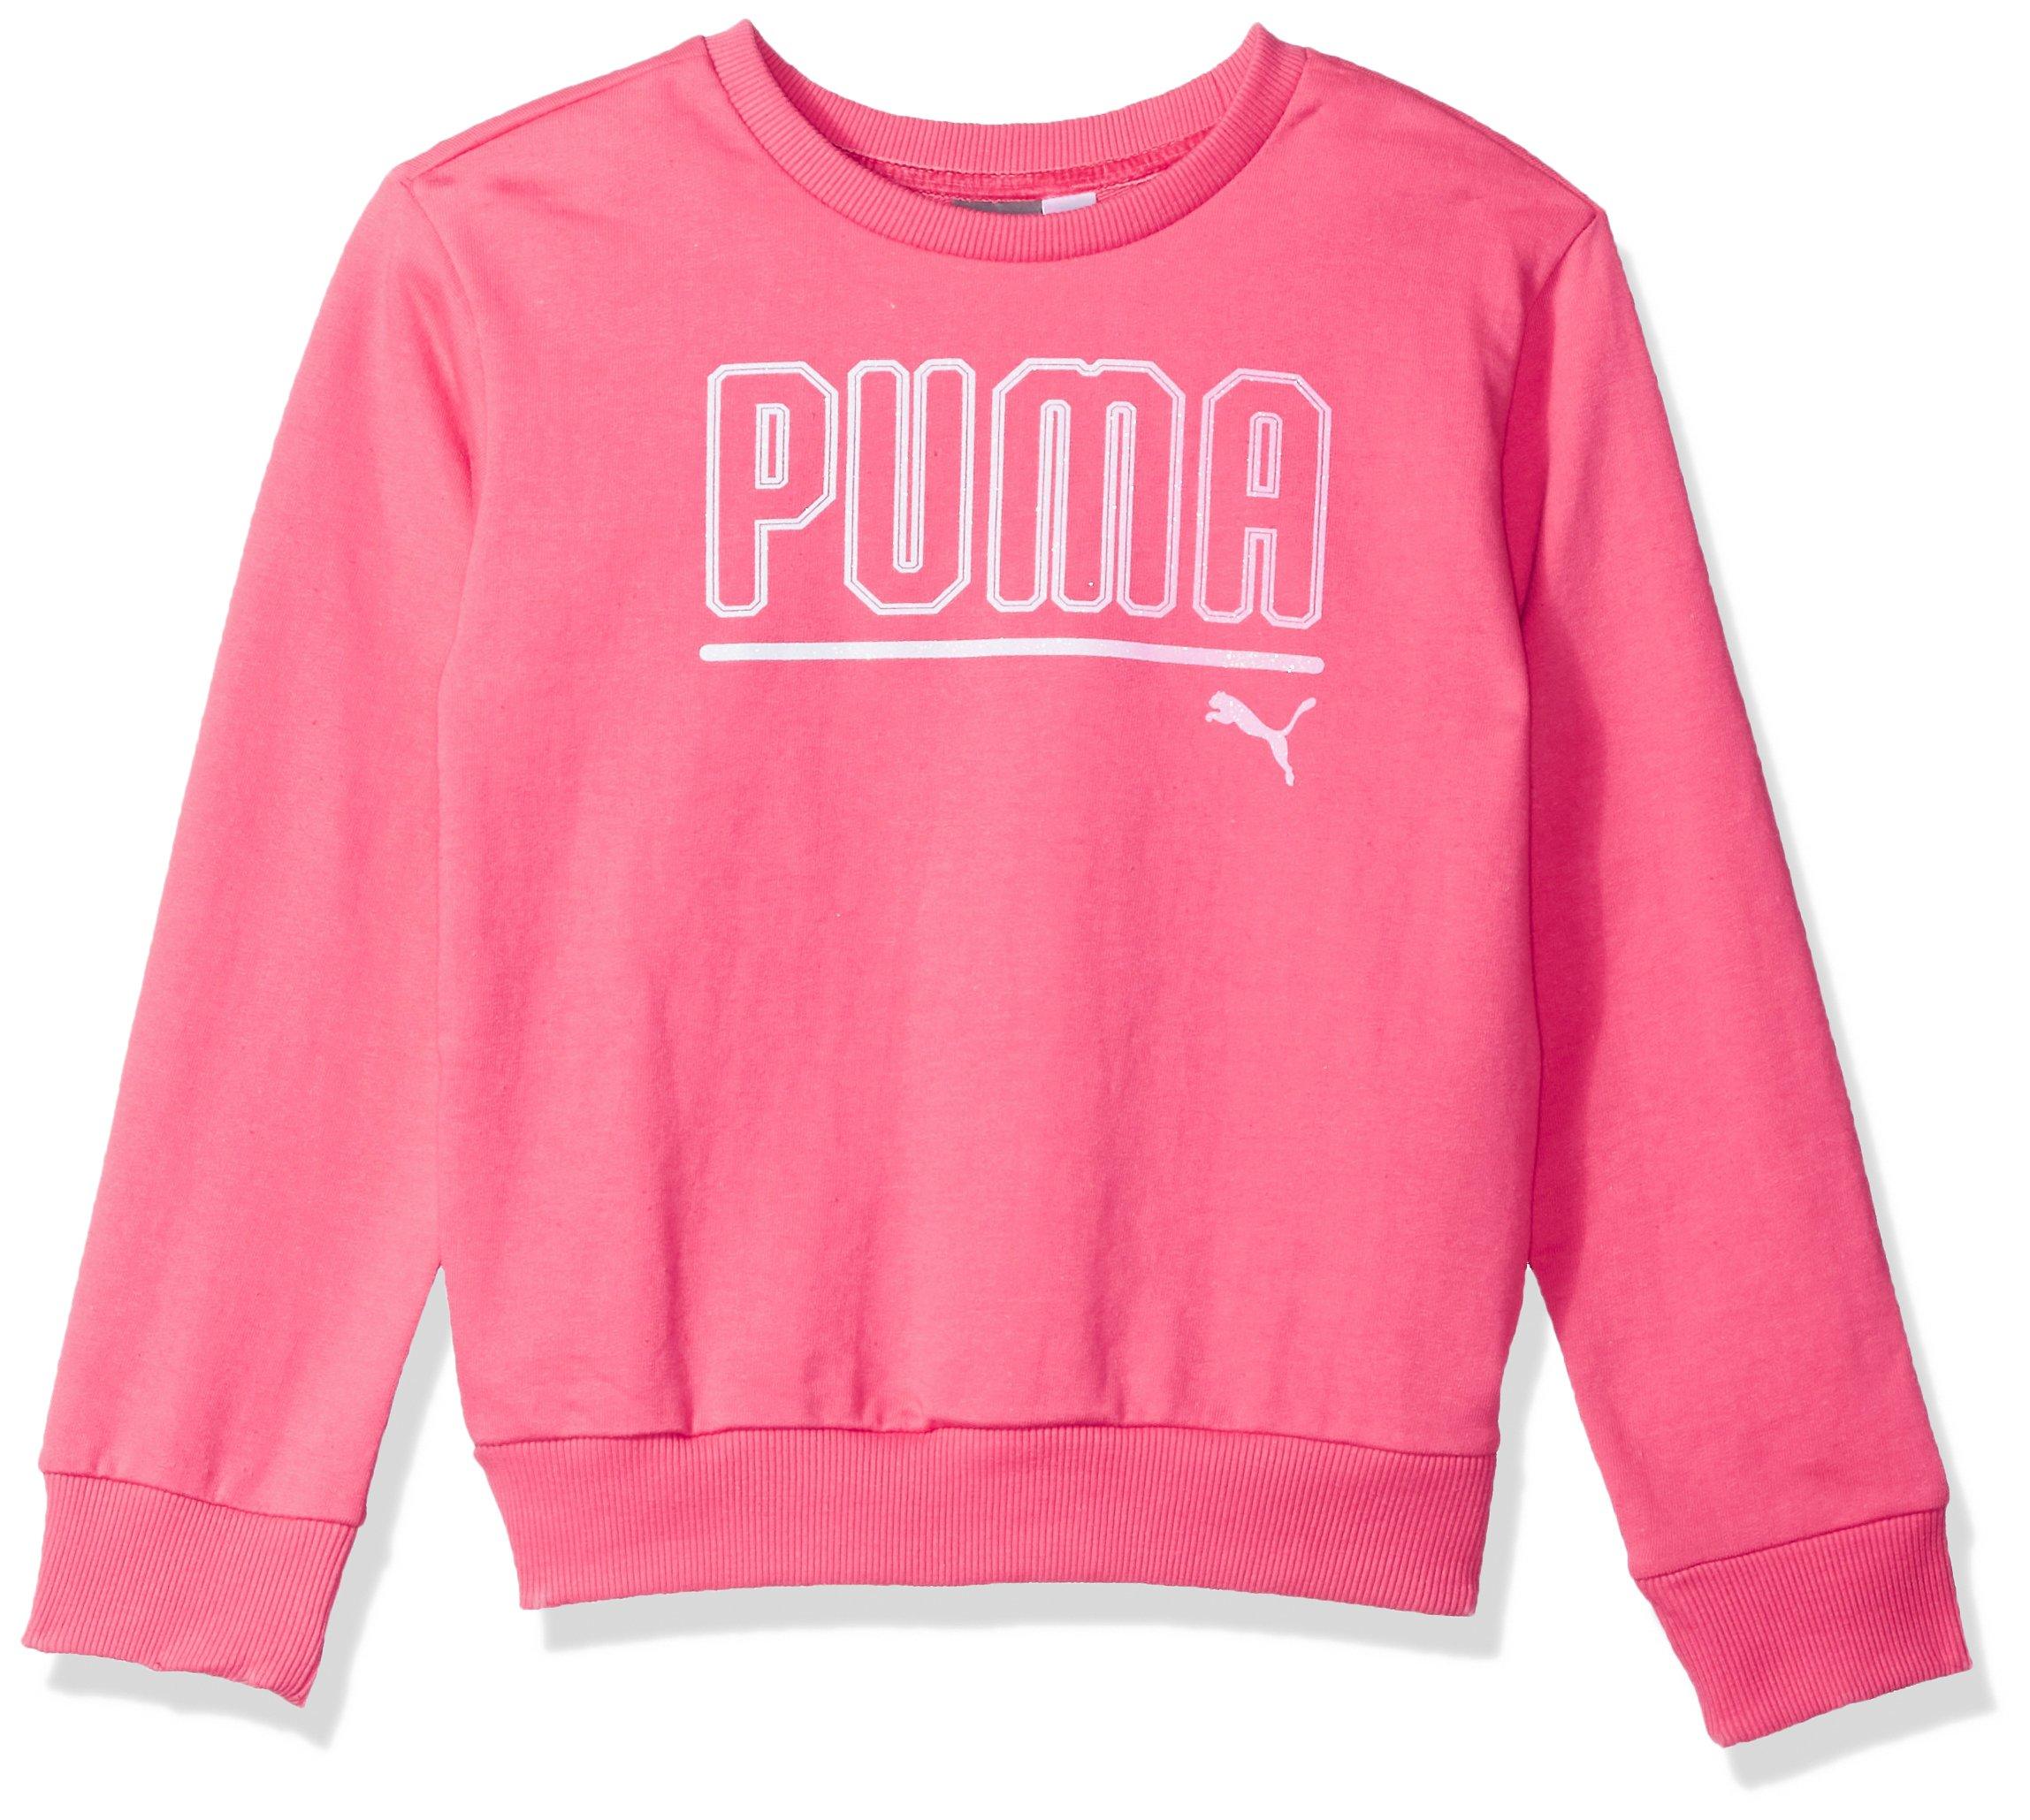 PUMA Big Girls' Crew Sweatshirt, Hot Pink, Small (7)